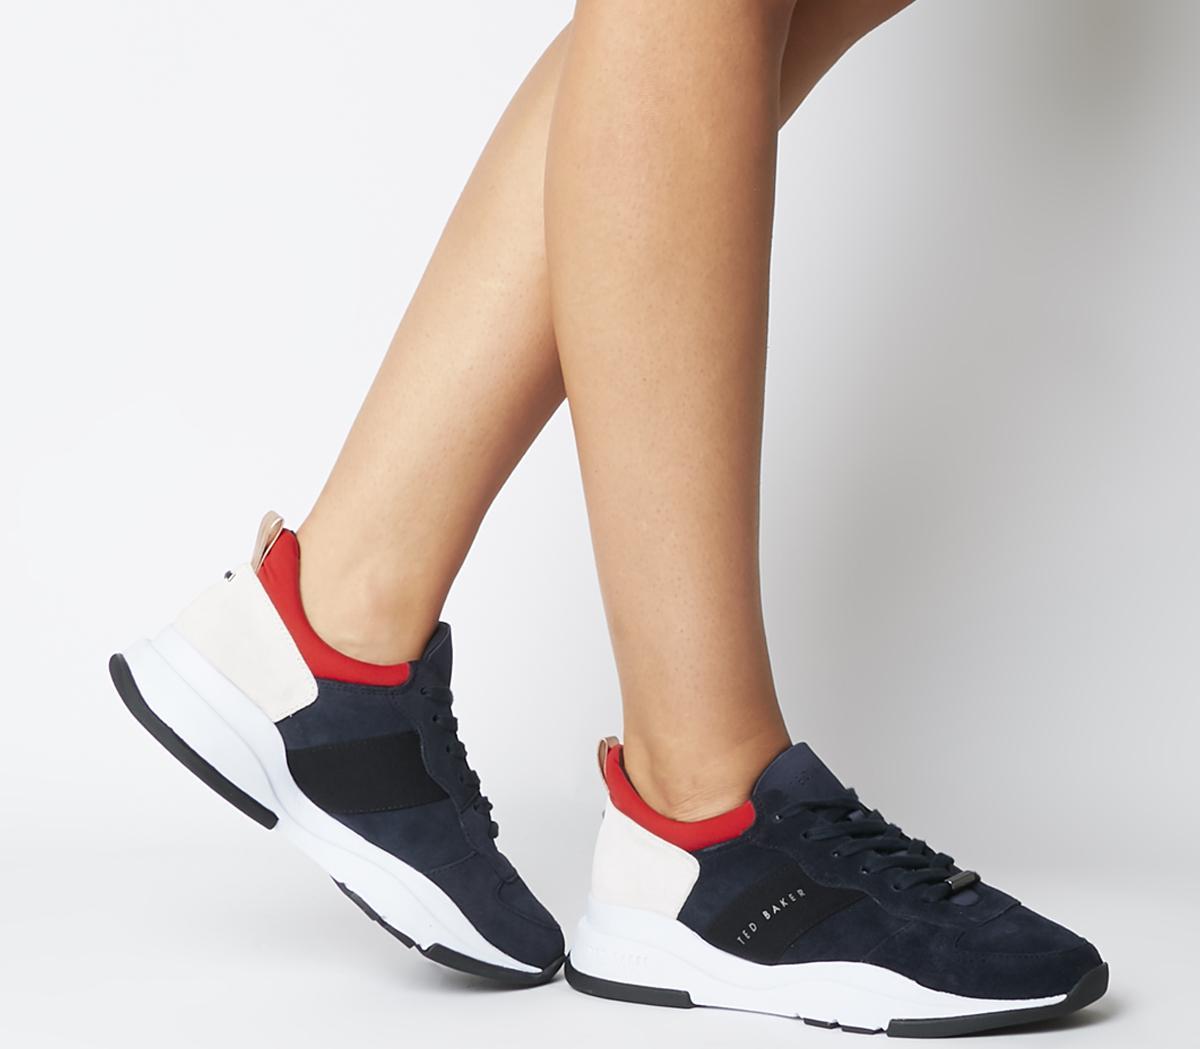 Ted Baker Waverdi Sneakers Navy - Flats